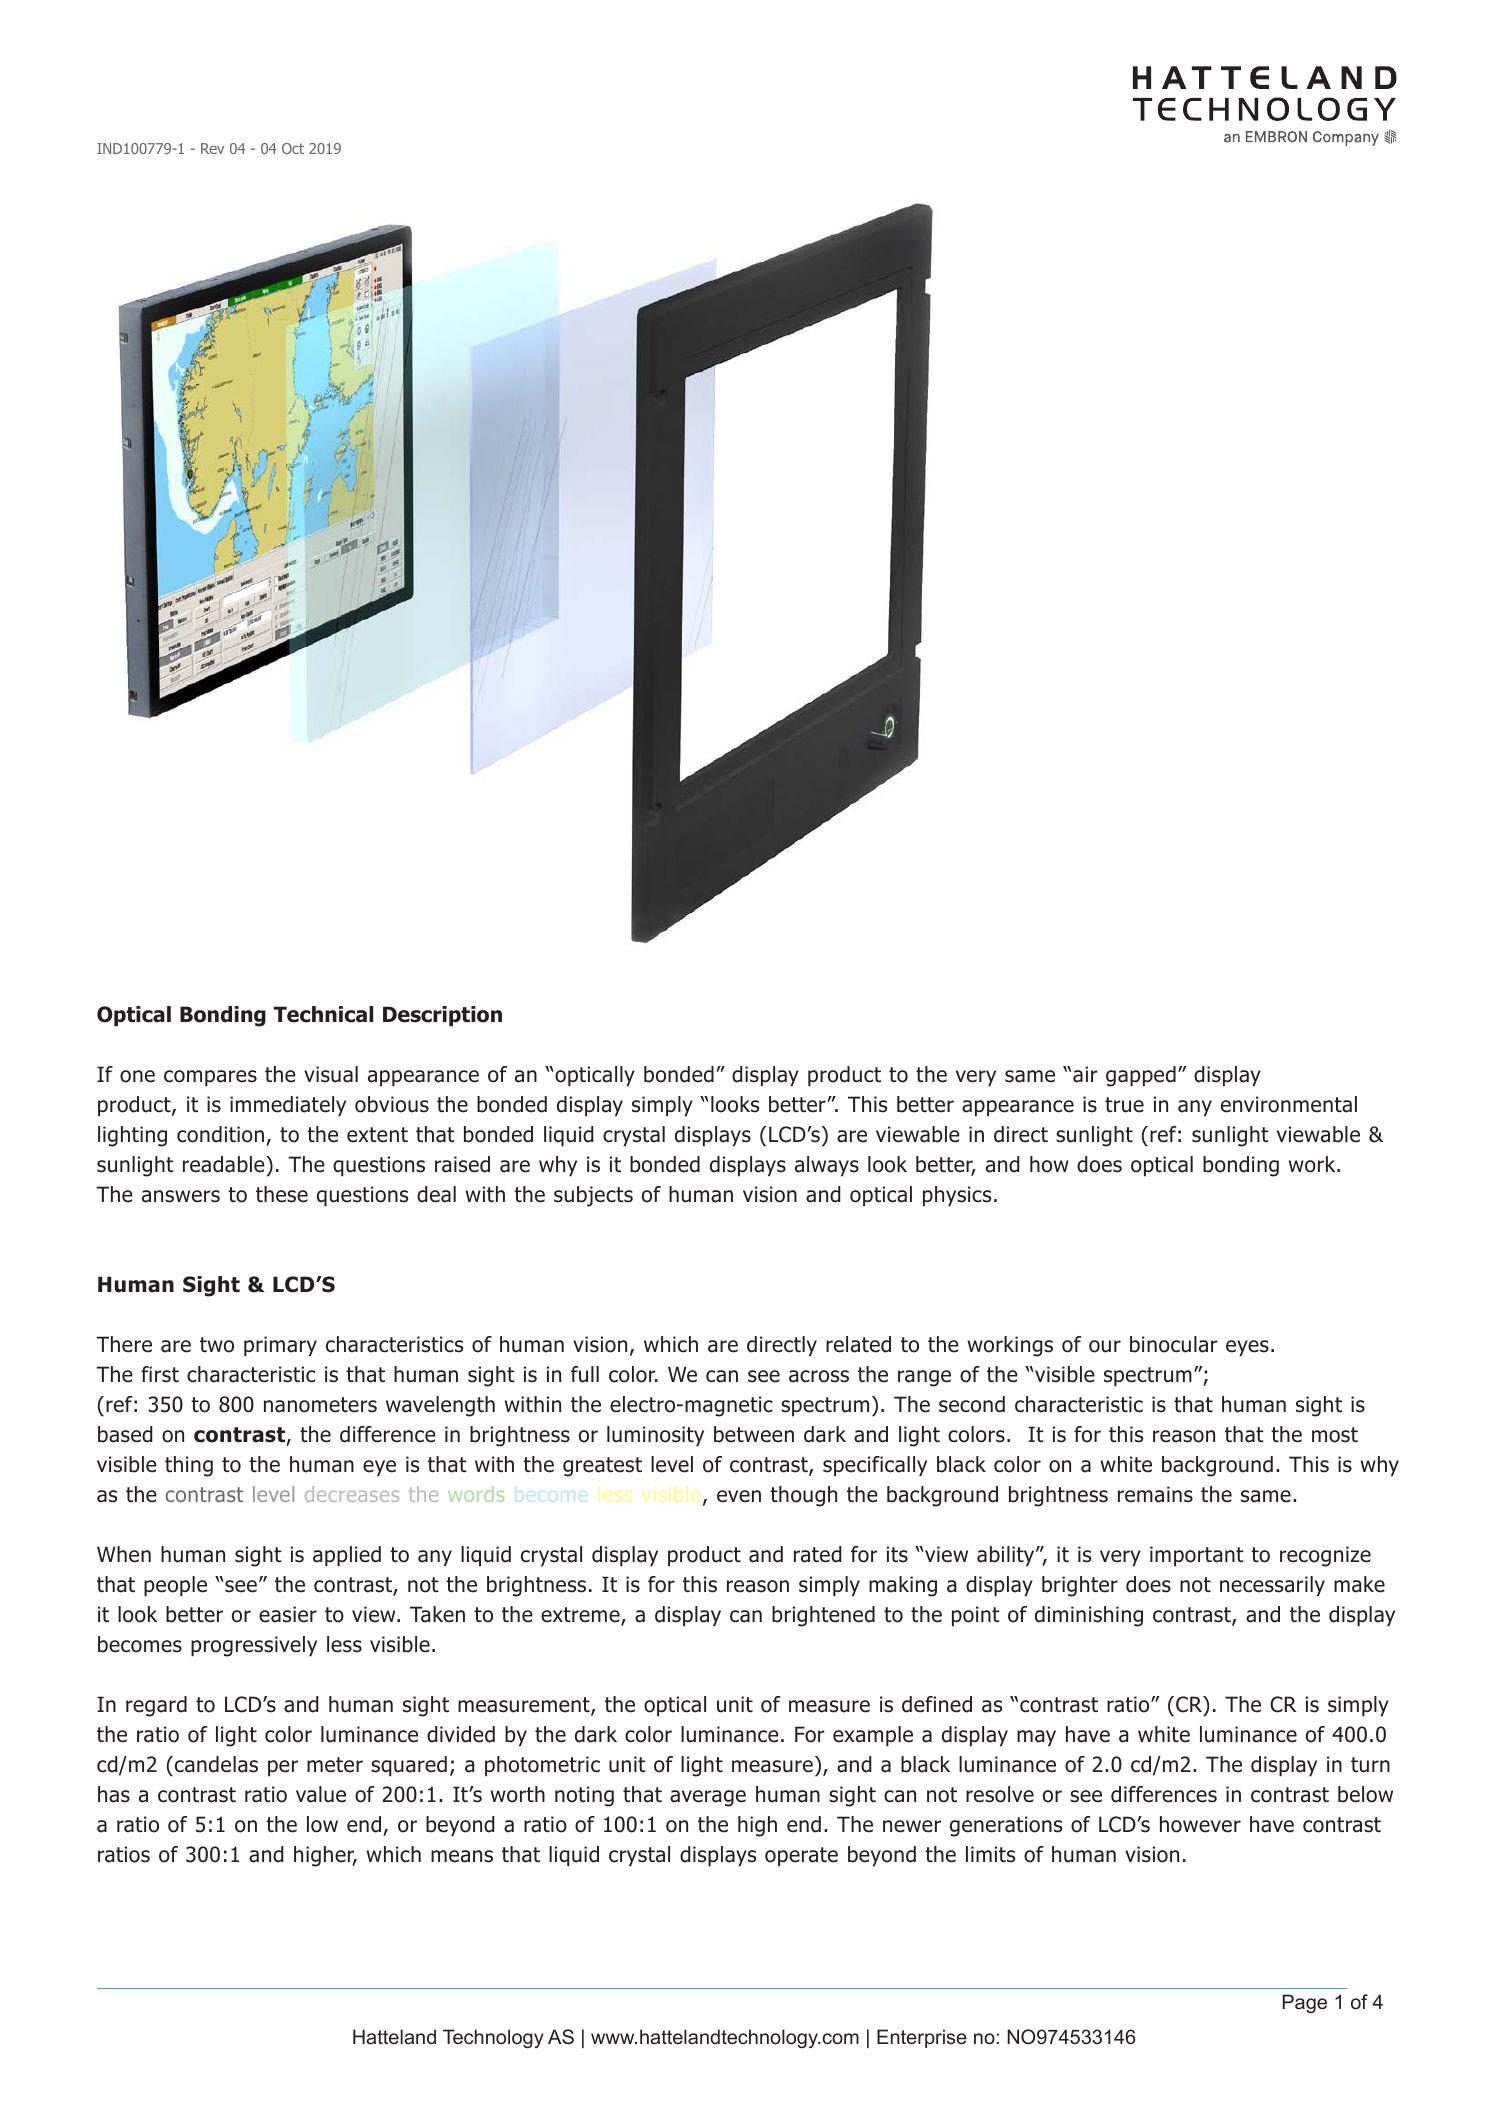 ind100779-1_techdesc_opticalbonding